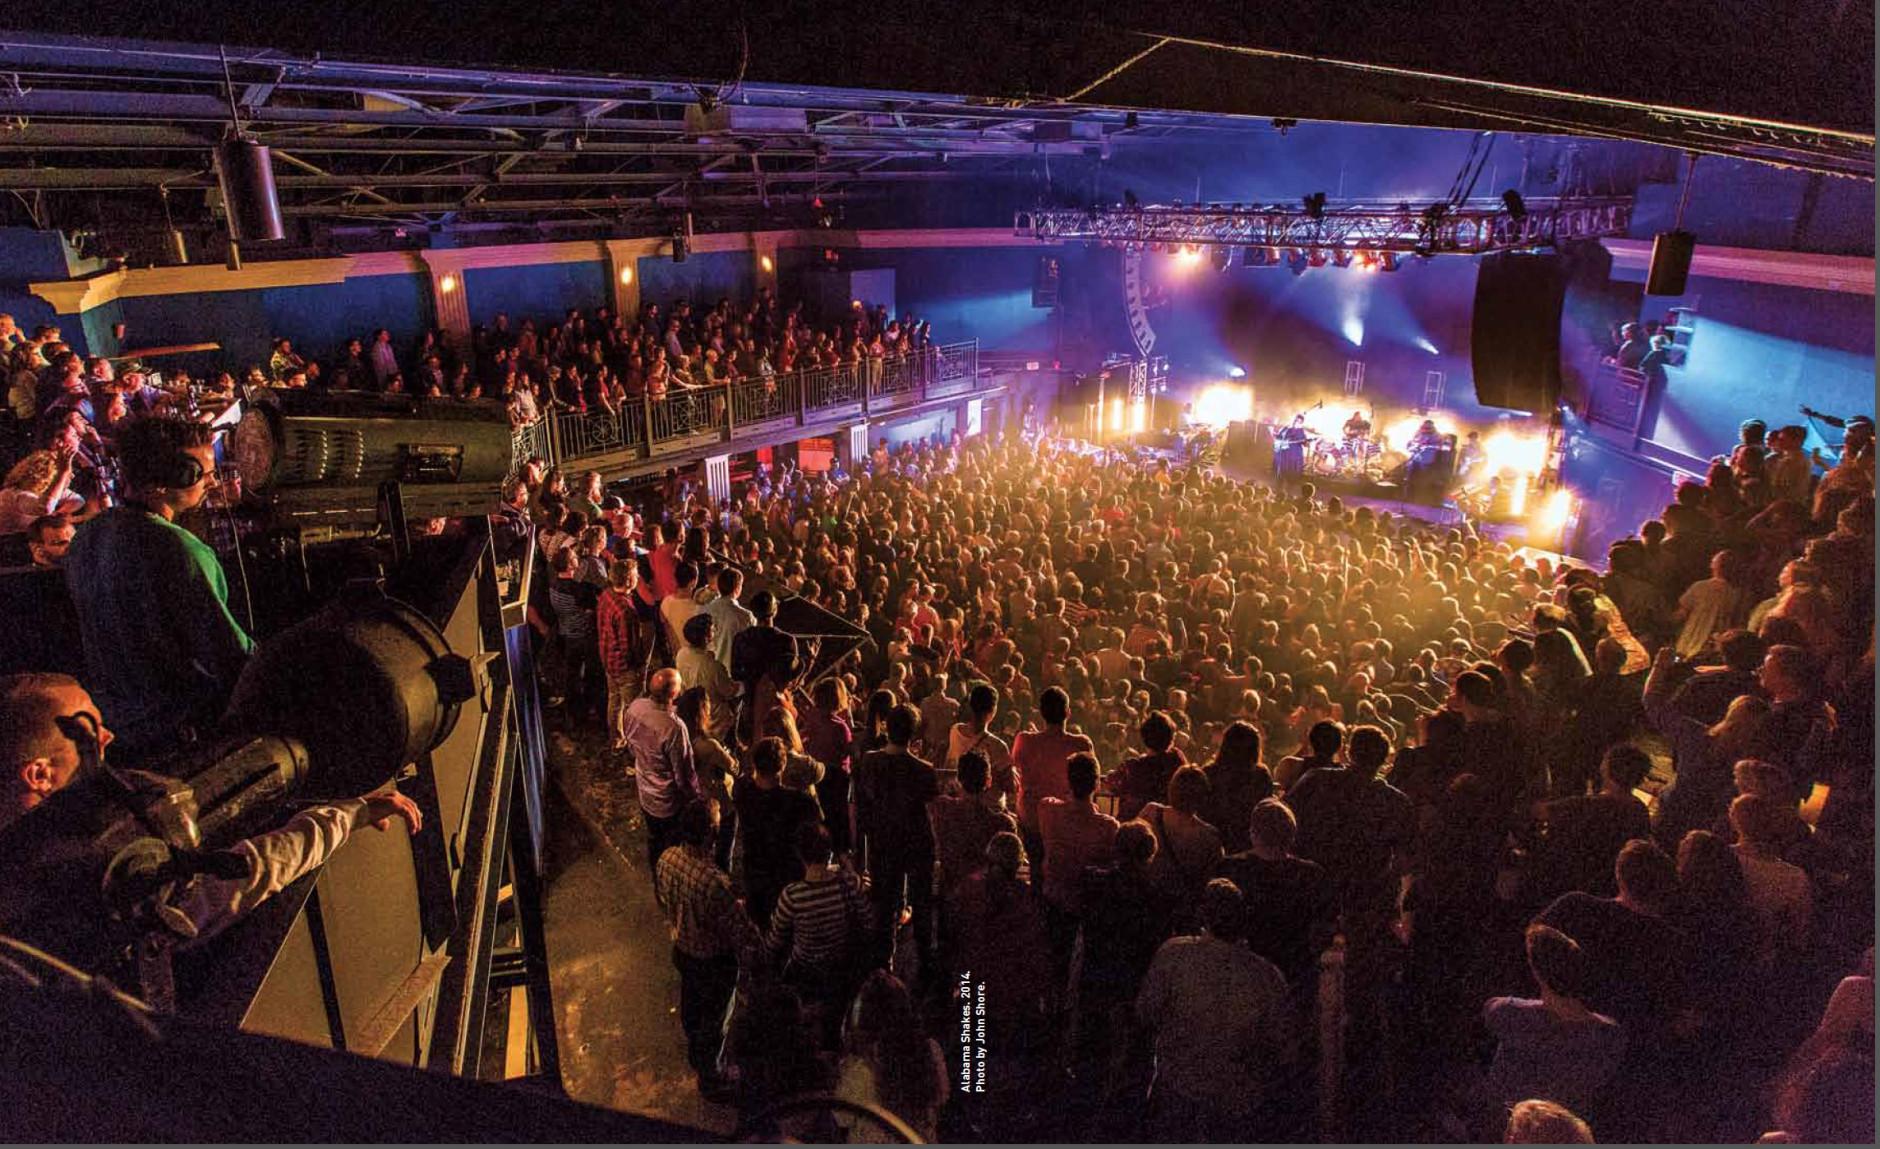 Alabama Shakes performs at the new club on 830 V Street. (Courtesy John Shore)